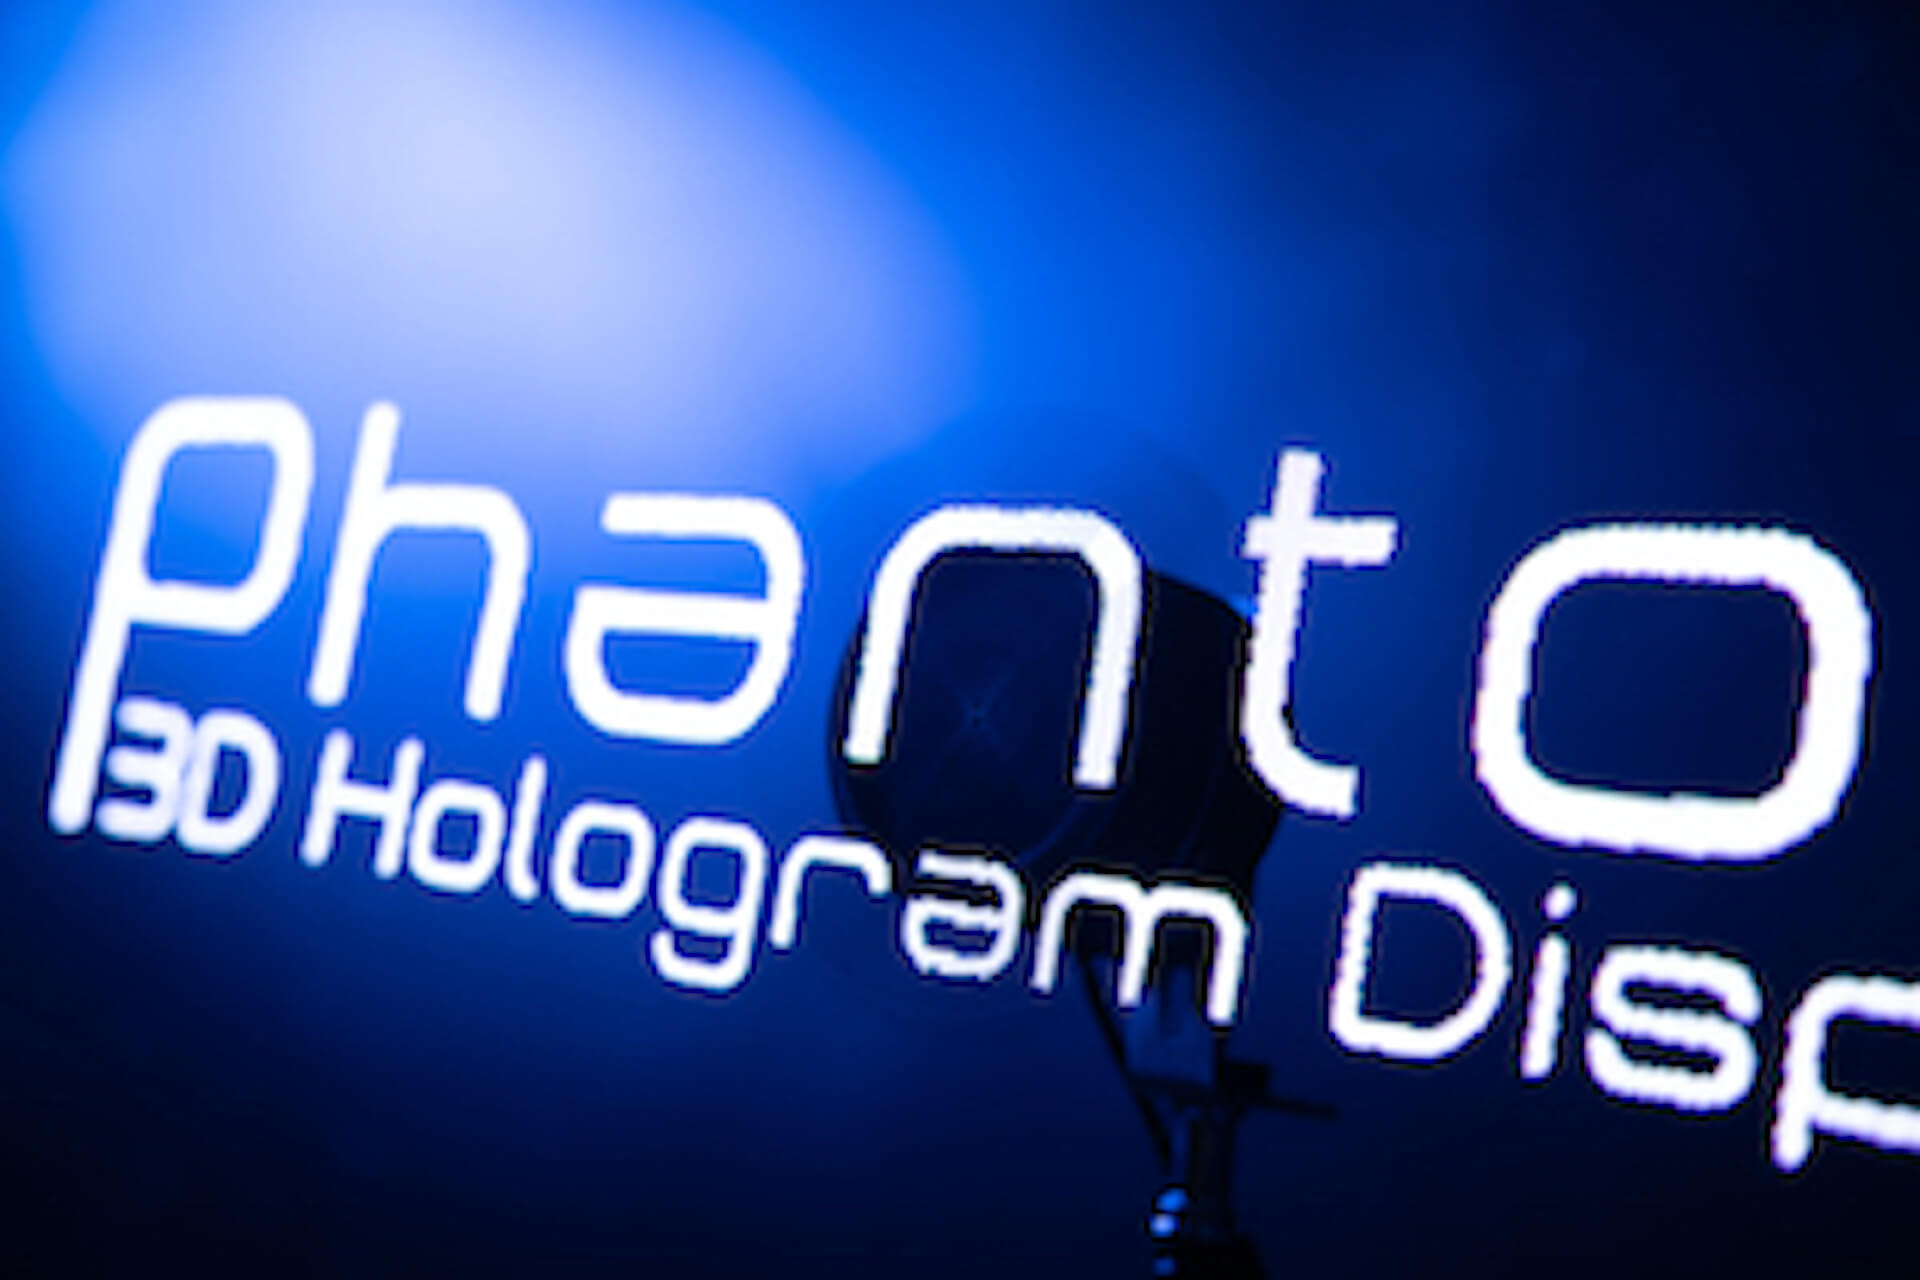 3D Phantom(R)を駆使した落合陽一の作品『Transformation of Scenery』が<アルスエレクトロニカフェスティバル 2021>に出展! tech210909_3dphantom_yoichi_ochiai_2